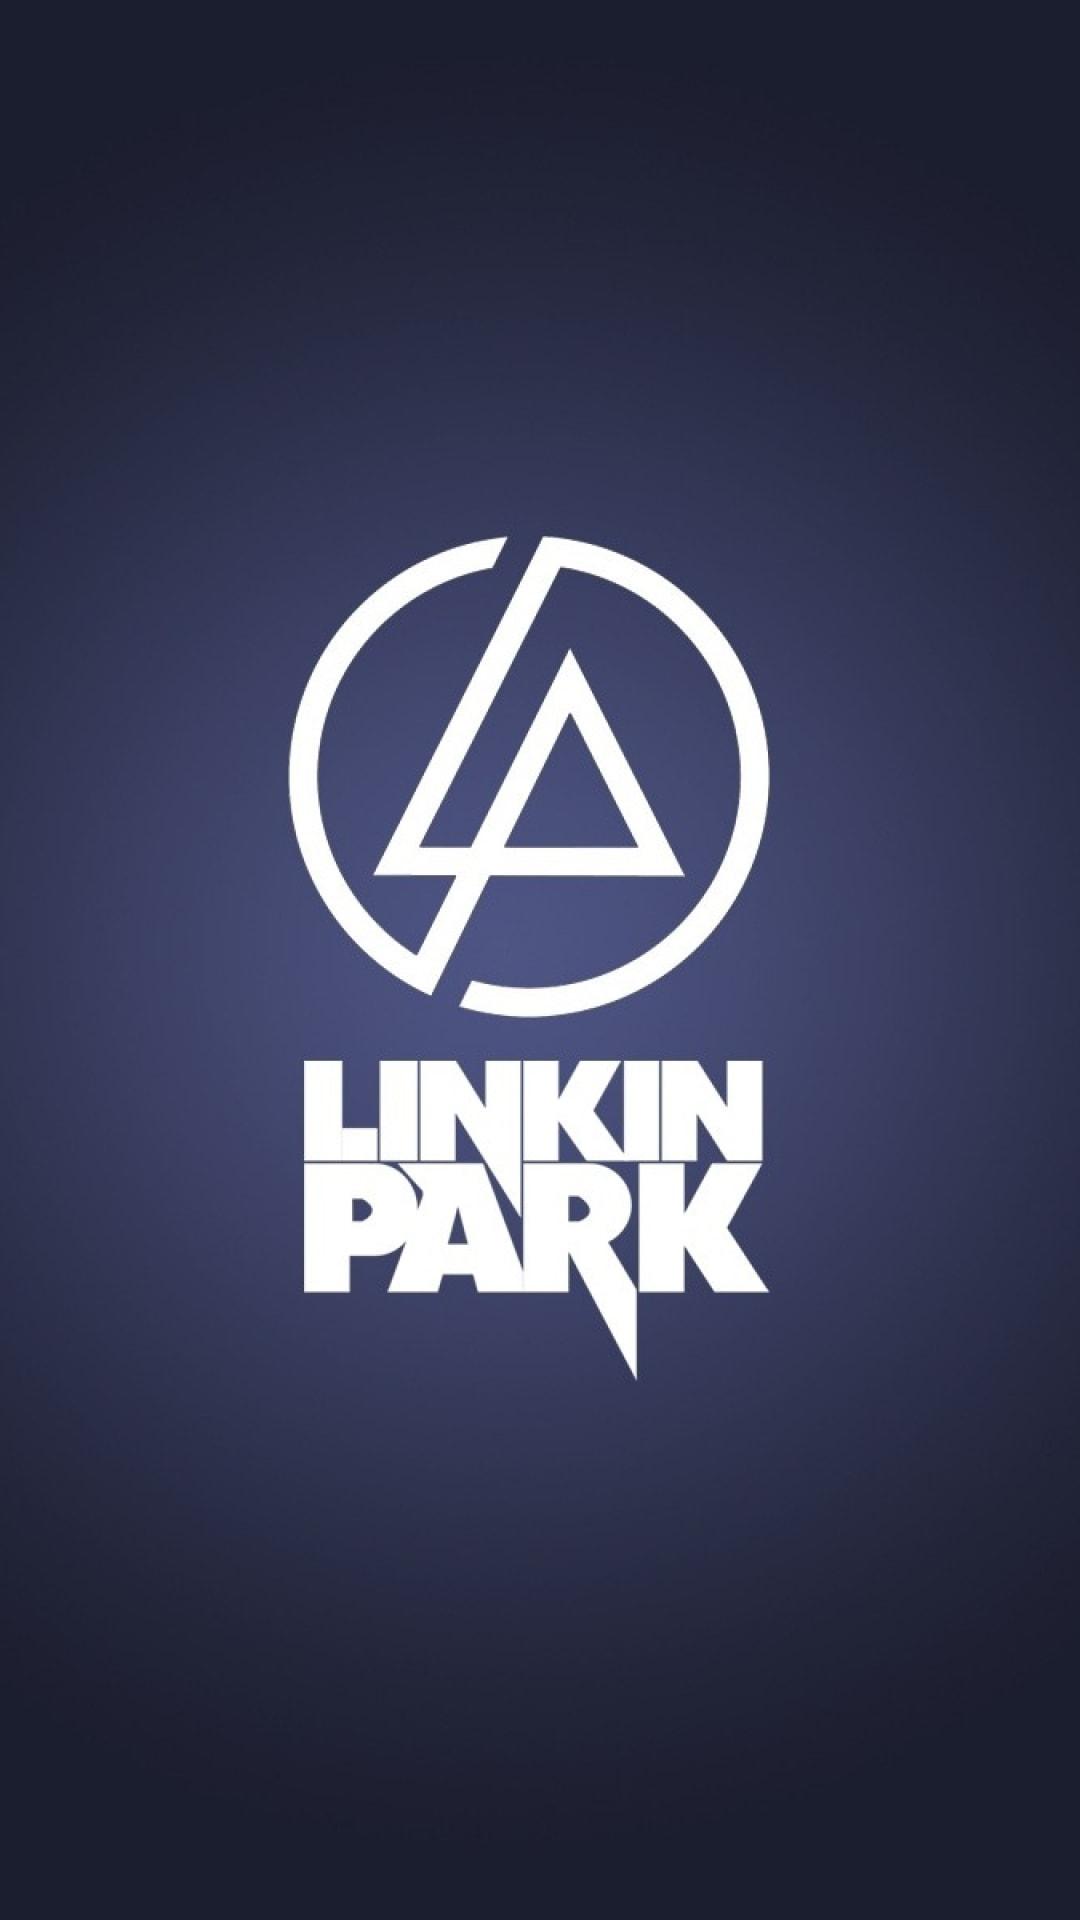 Linkin Park For mobile